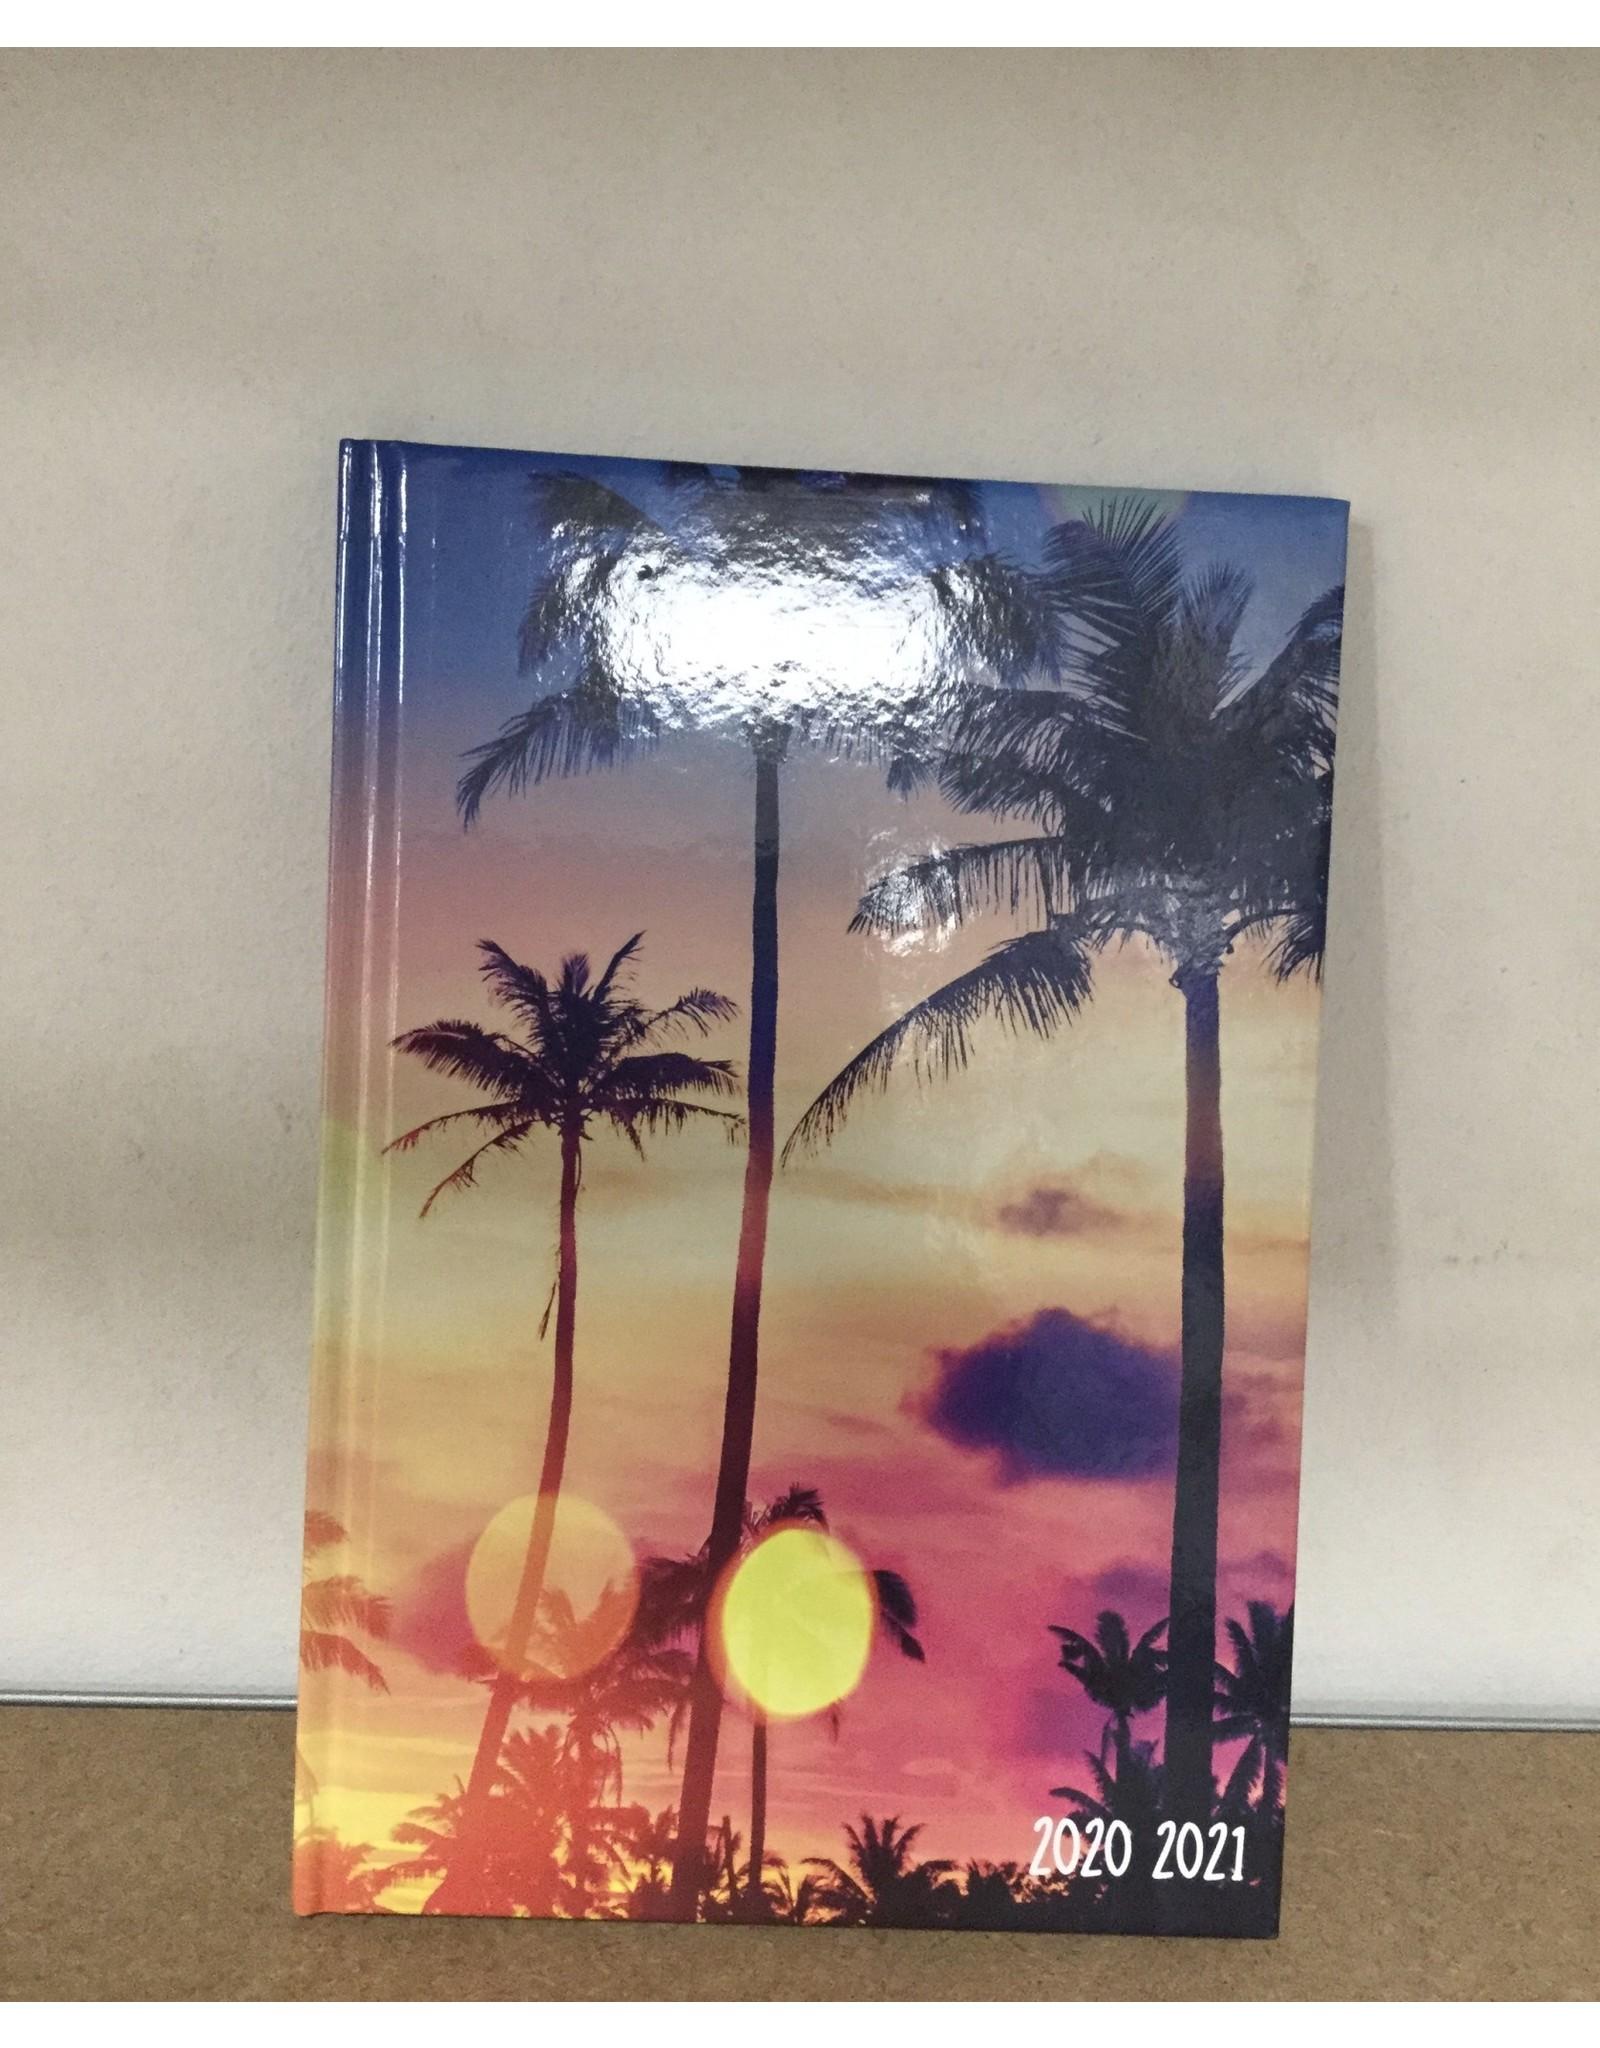 AGENDA HK PALM BEACH A5 20-21